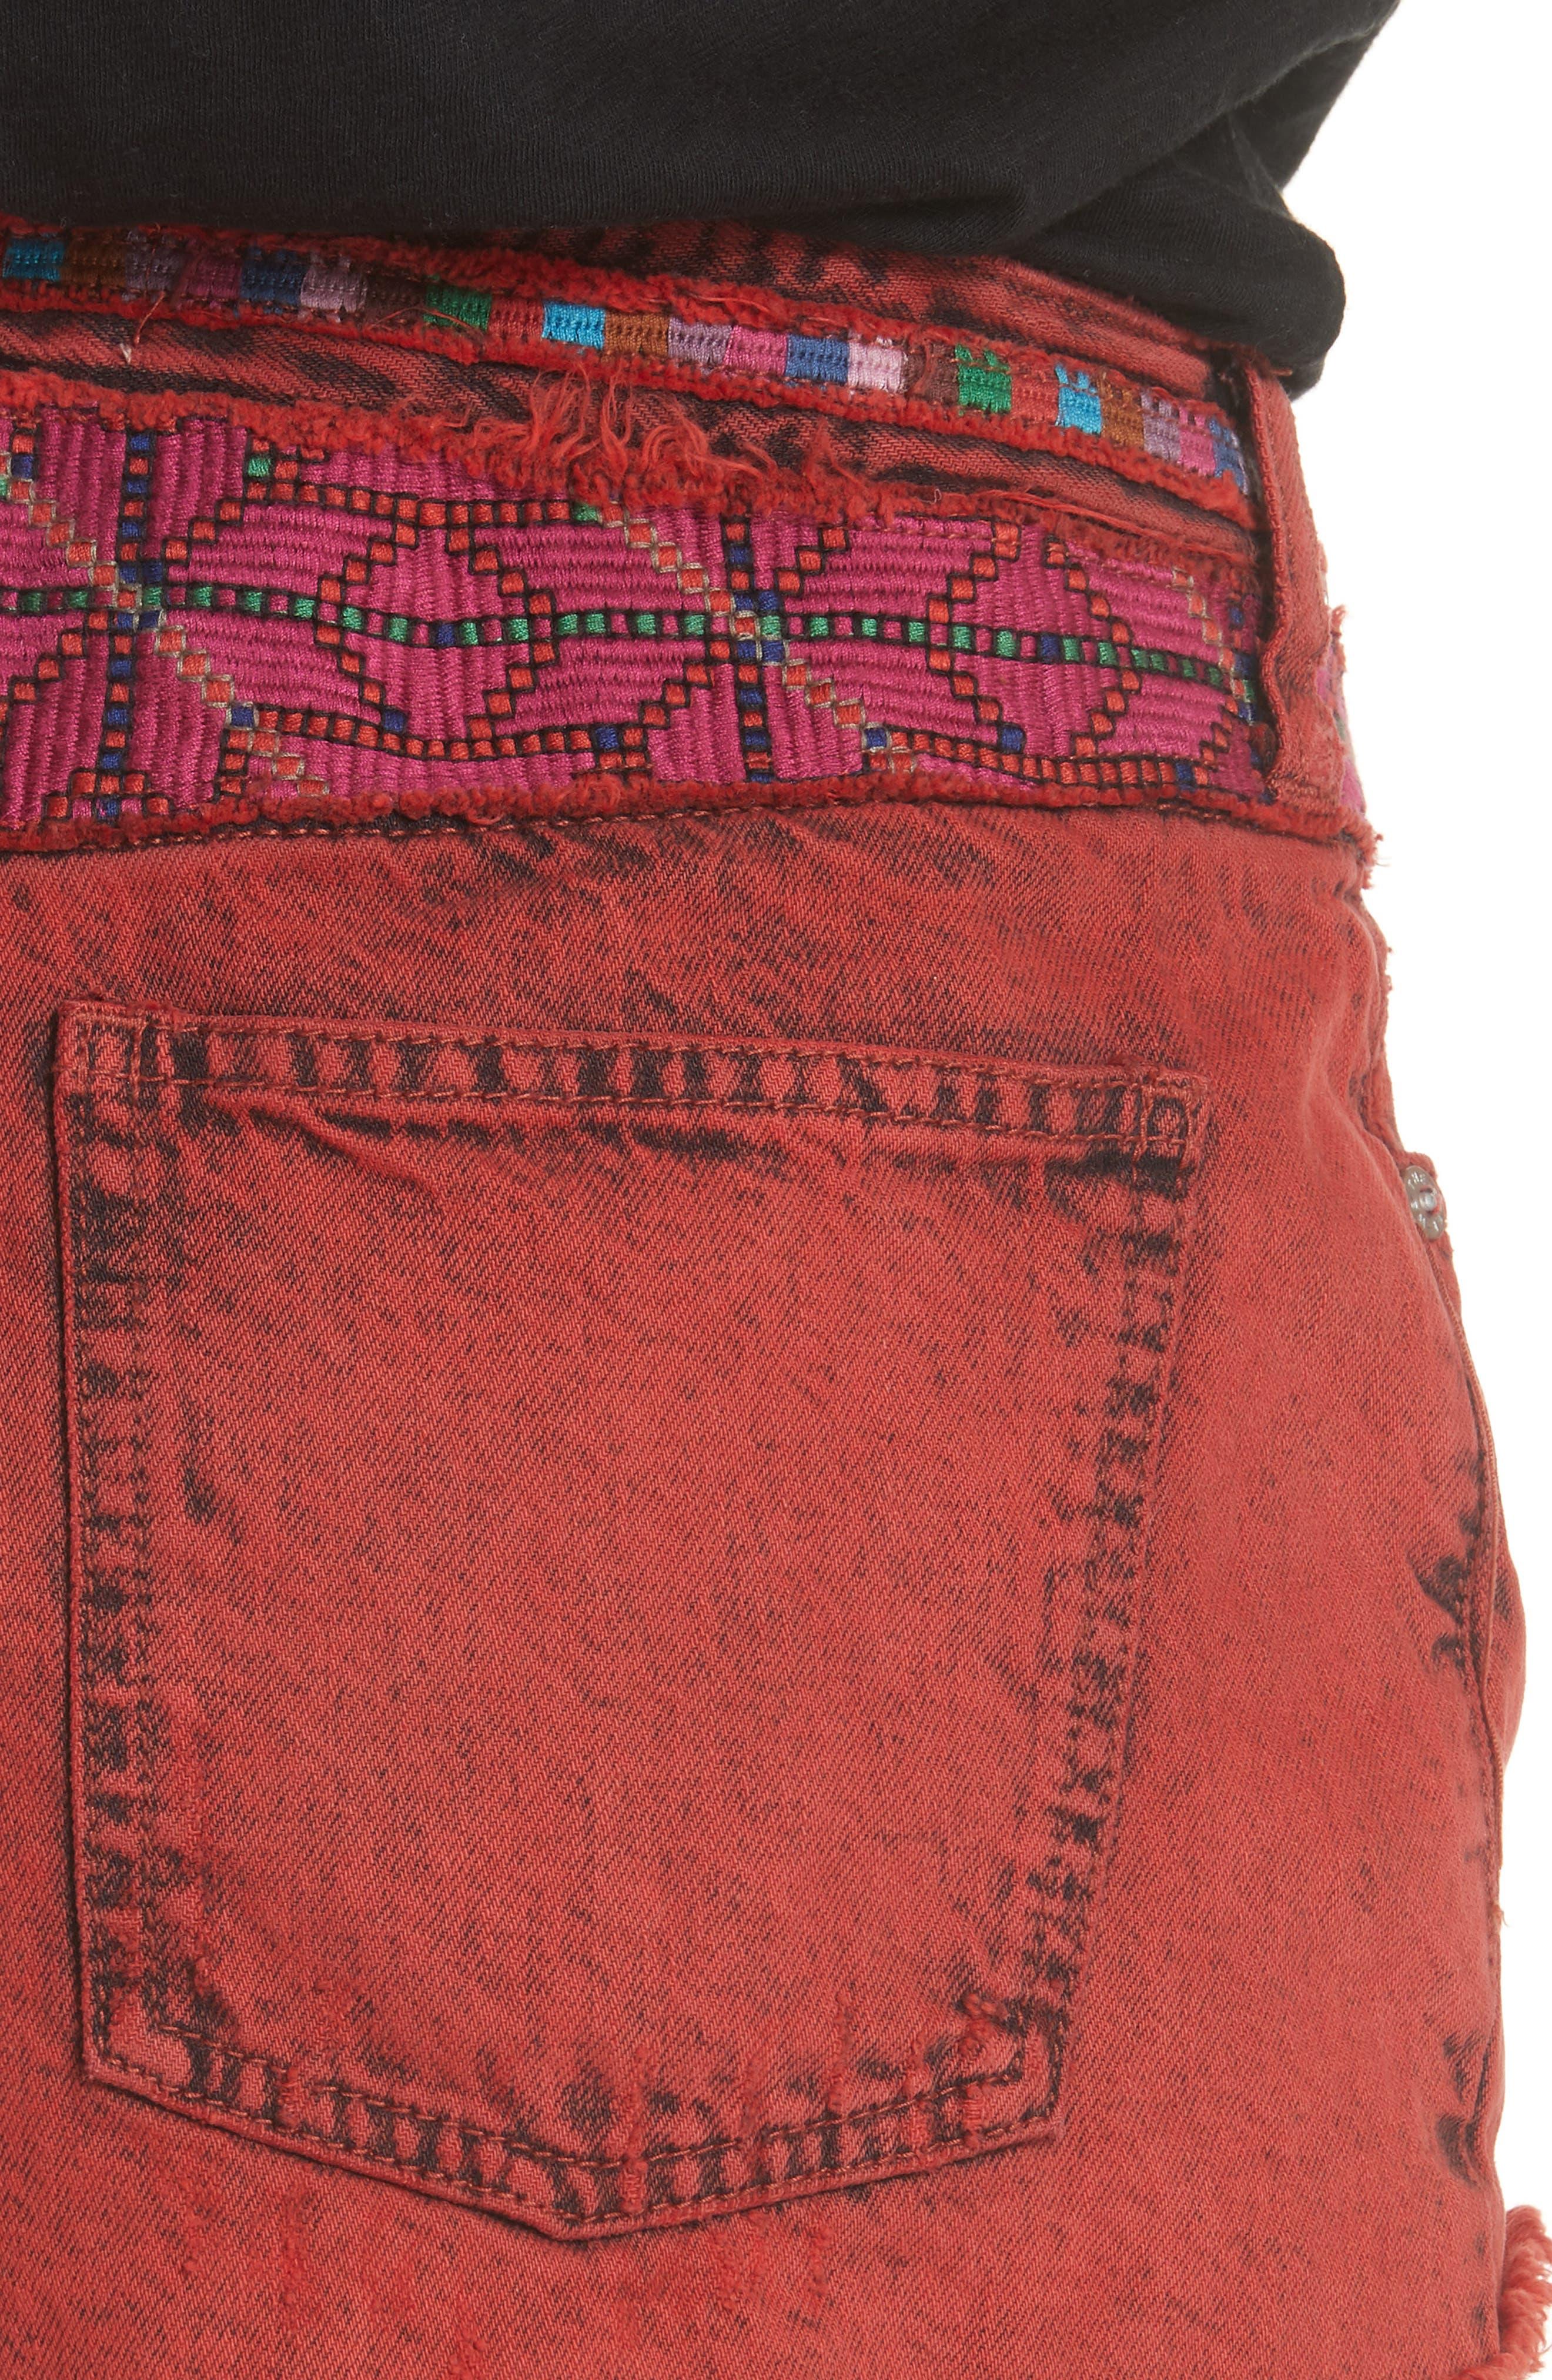 Sun Break Embellished Cutoff Shorts,                             Alternate thumbnail 4, color,                             600